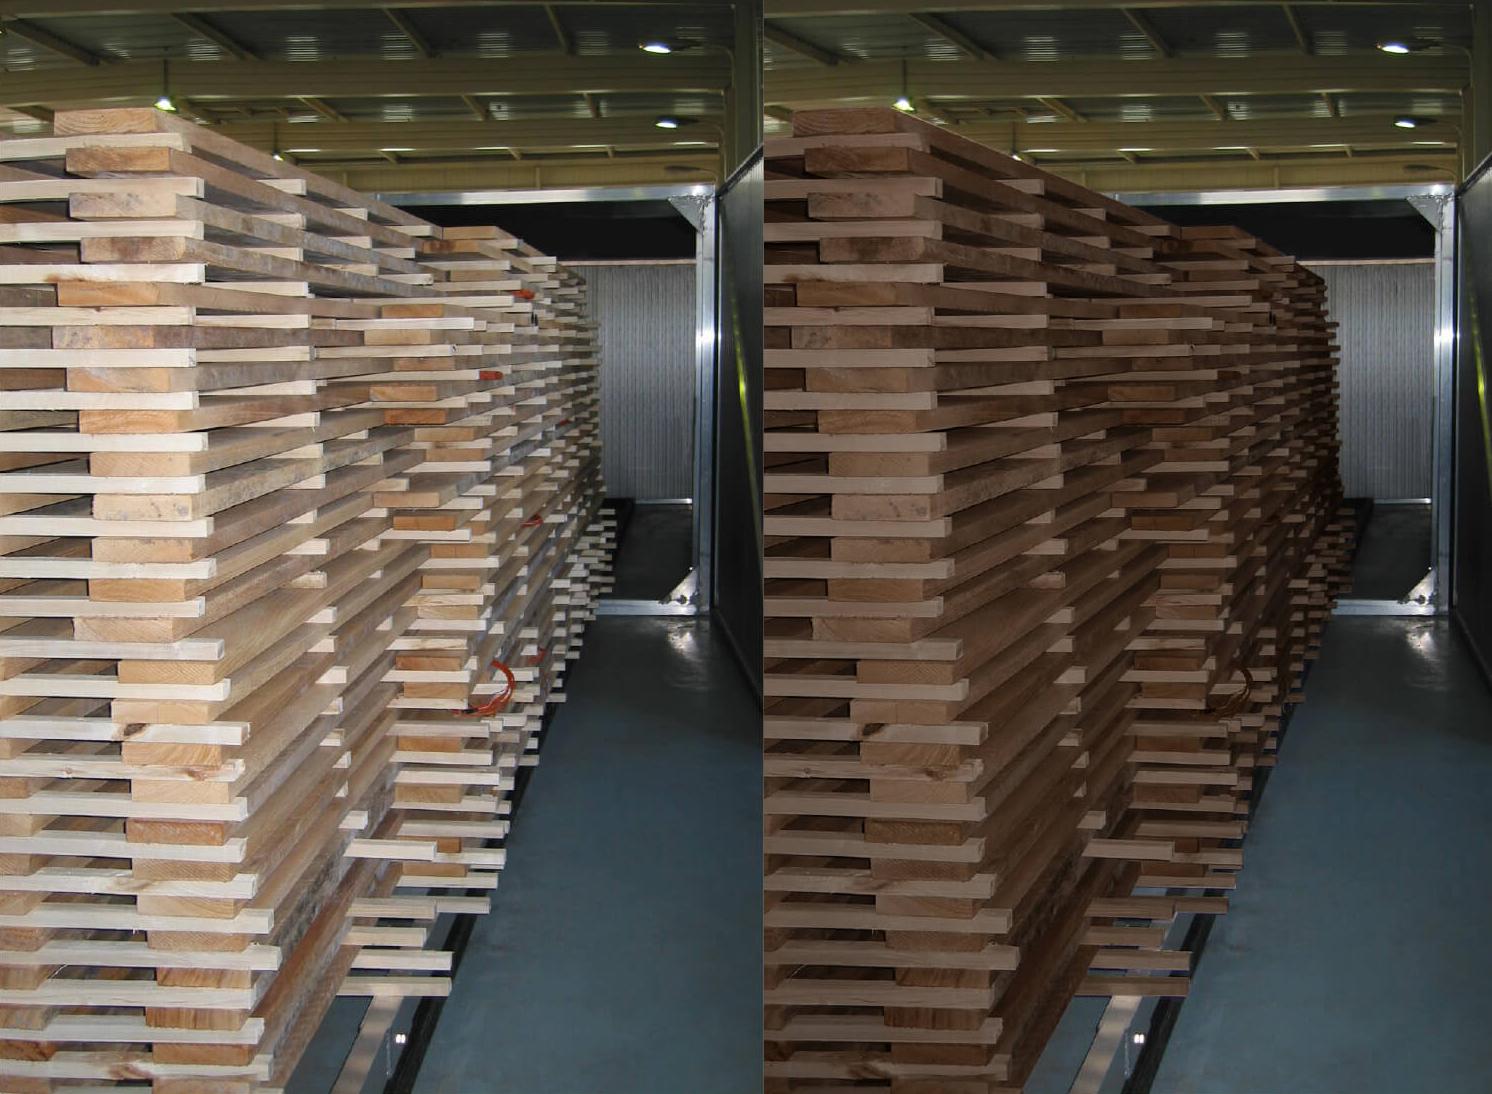 Incomac - high-temperature-kilns-for-wood-incomac